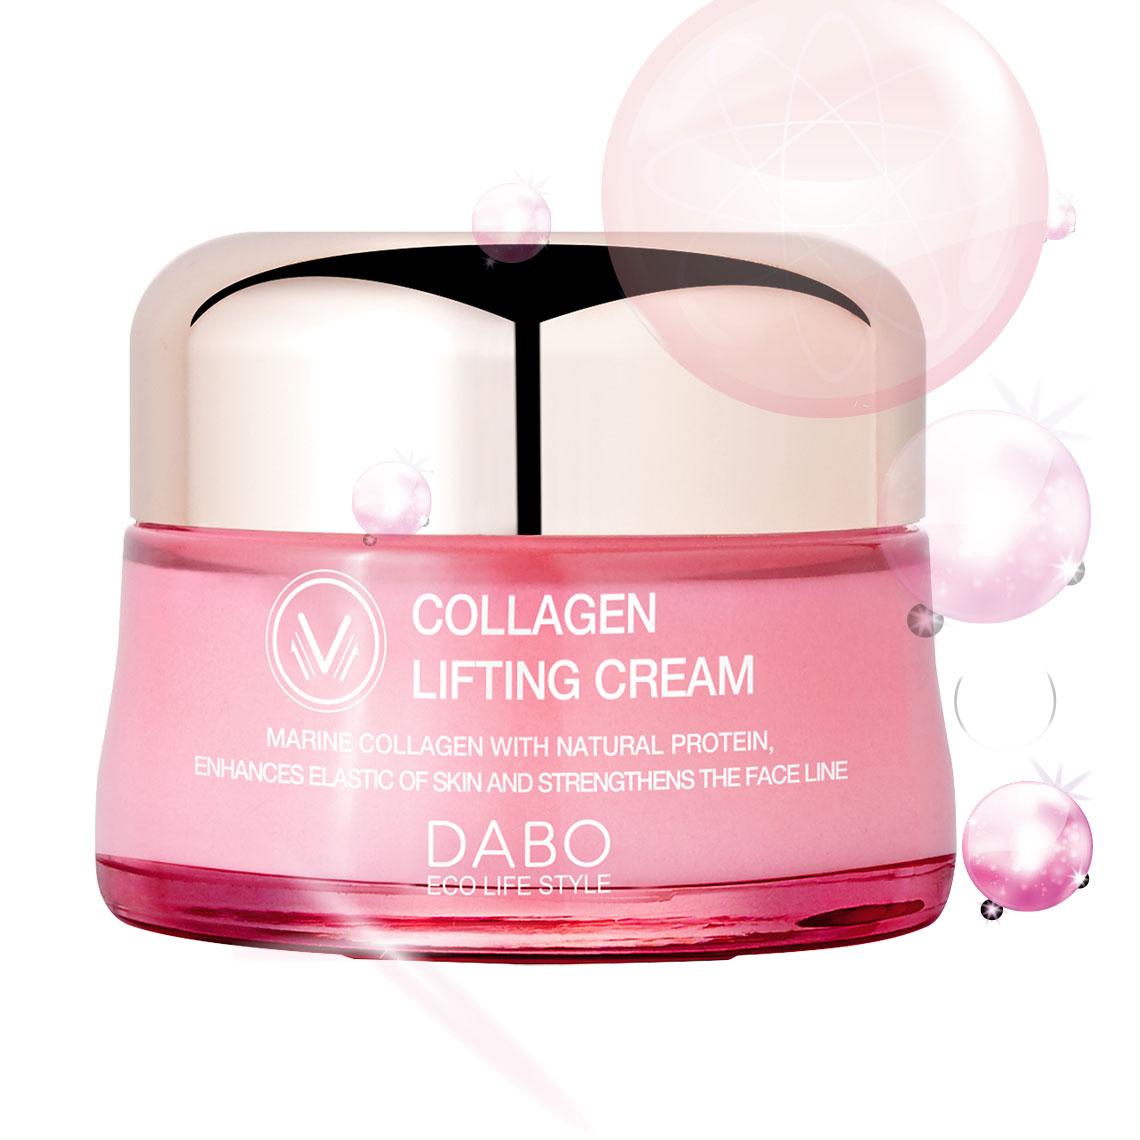 Kem cao cấp Collagen nâng cơ da - DABO Collagen Lifting Cream